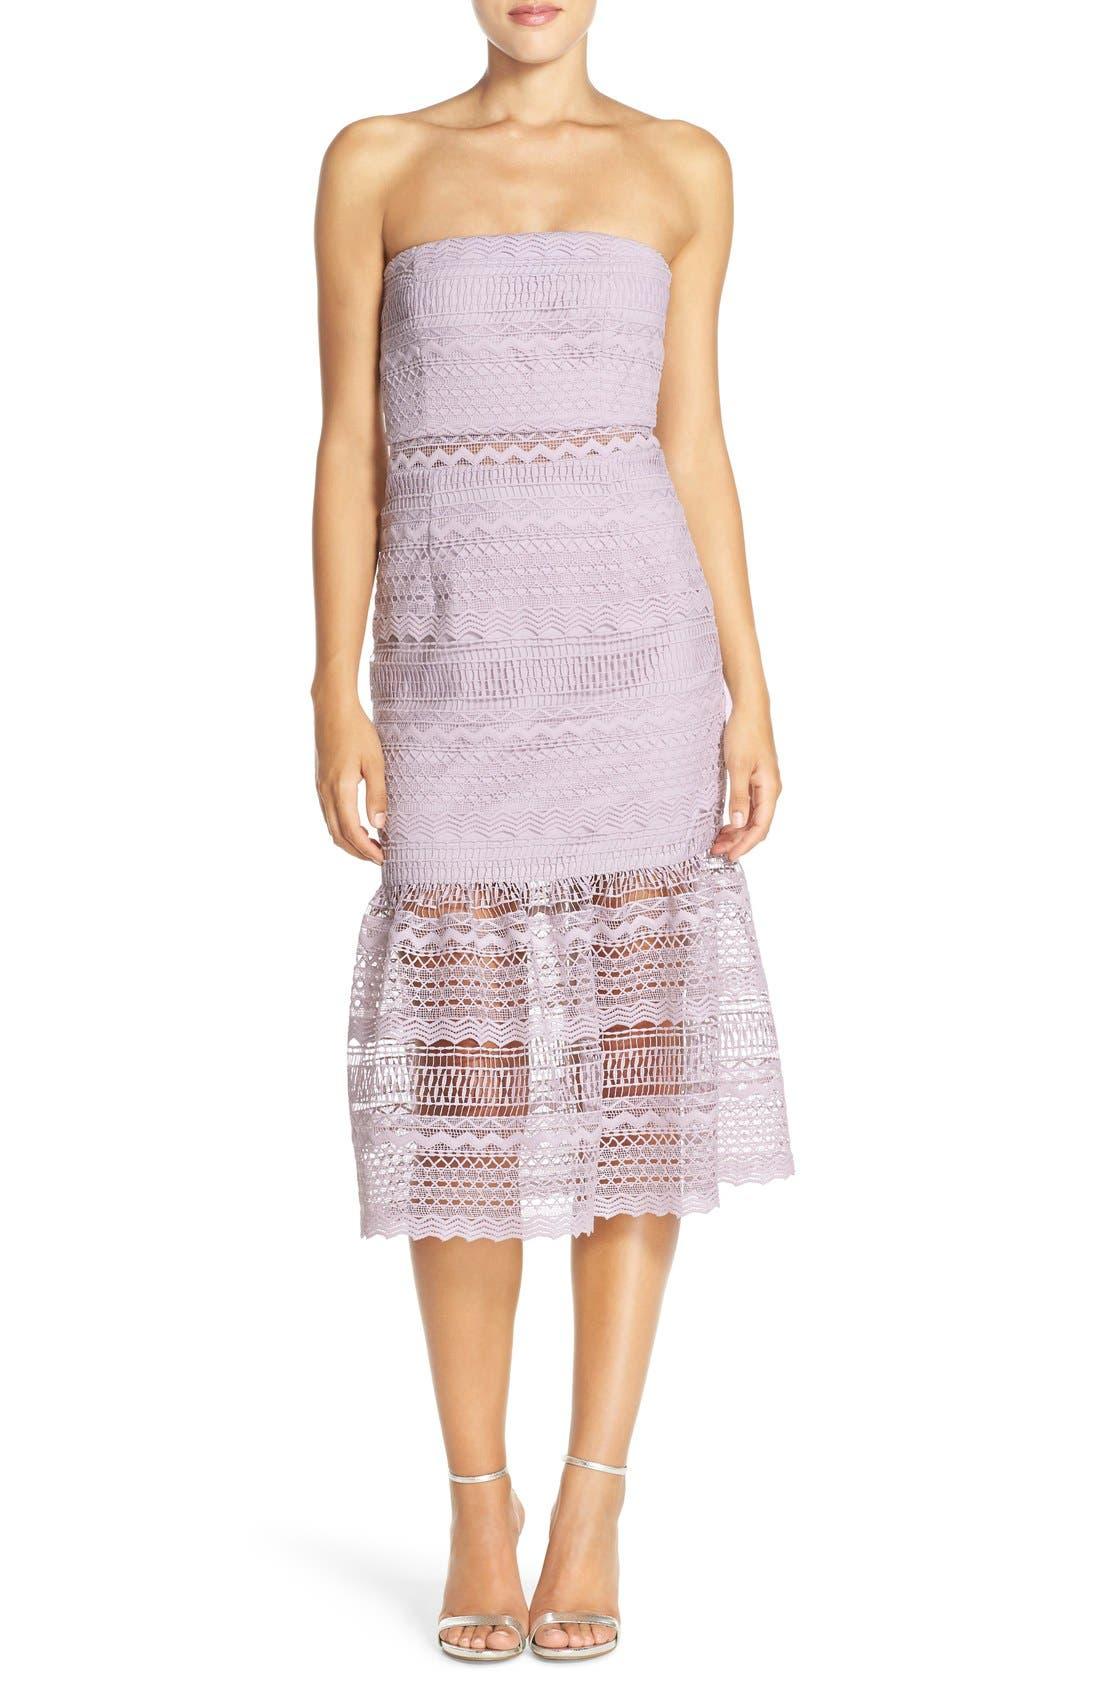 Alternate Image 1 Selected - Bardot 'Lily' Strapless Lace Midi Dress